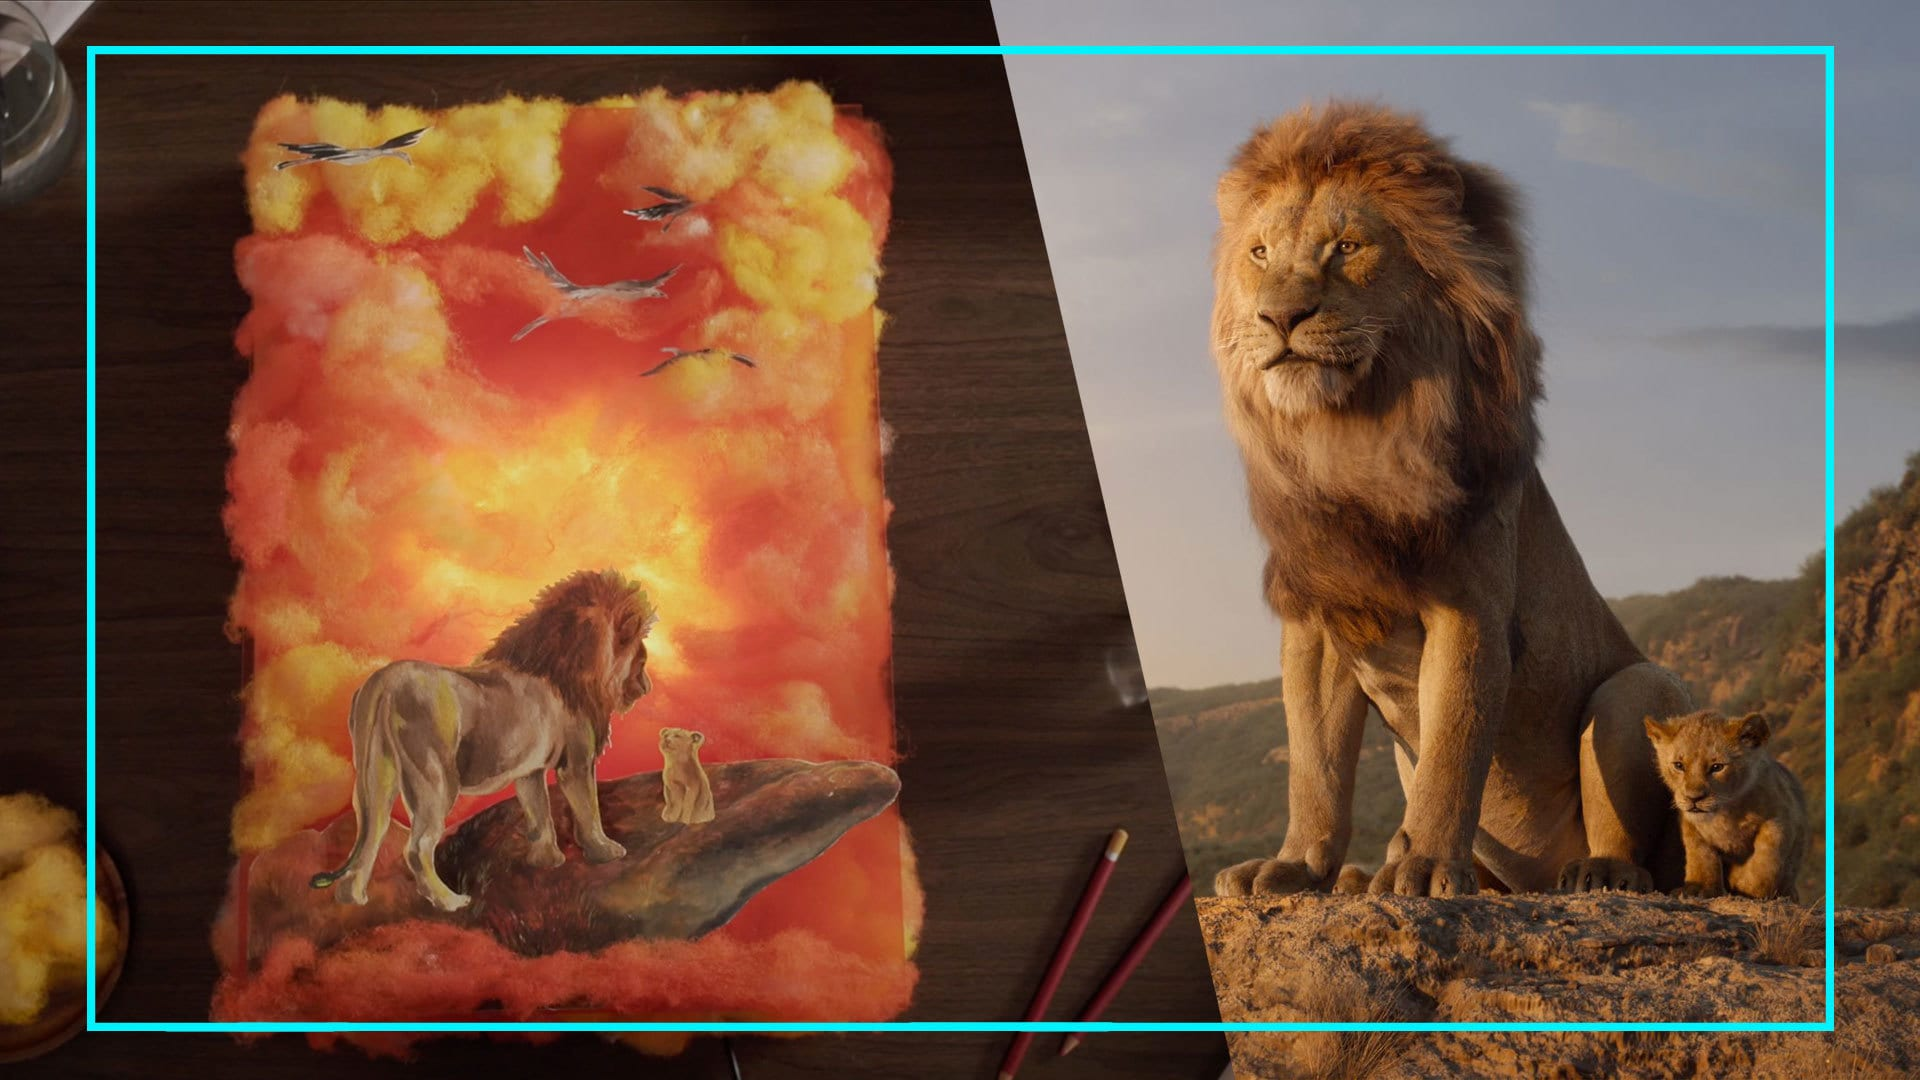 Disney Style: Disney's The Lion King ศิลปะที่สร้างสรรค์จากอิลัสเตรเตอร์ชาวไทย Darisa Riety Karnpoj